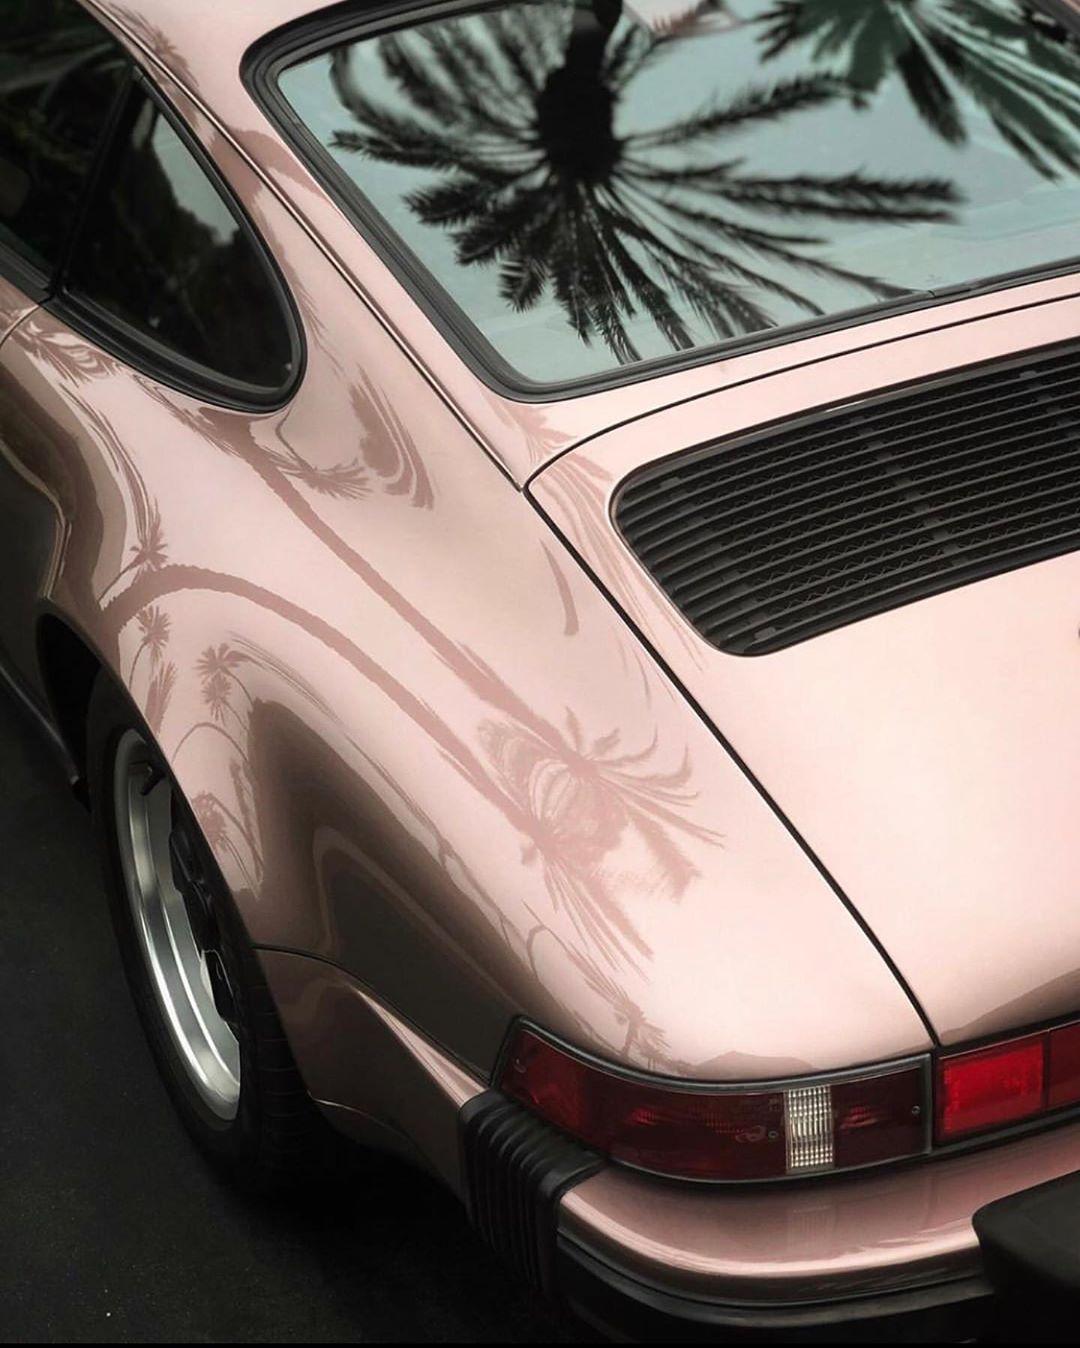 damon jones on instagram cassis red turbokyoko in 2020 damon jones porsche 911 turbo damon jones porsche 911 turbo